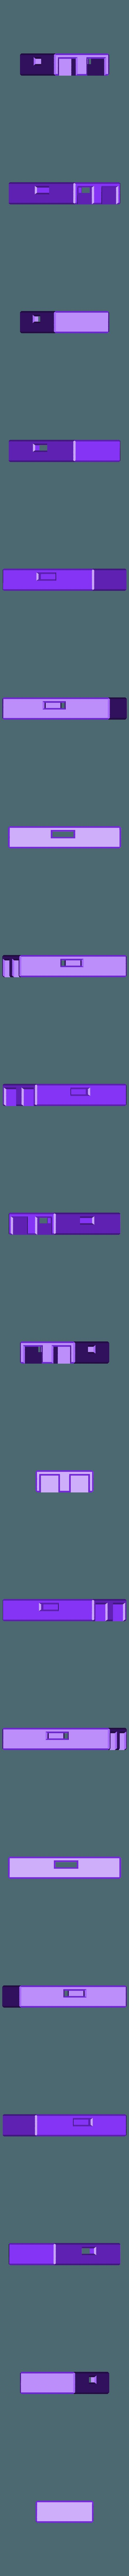 battholder3600.stl Télécharger fichier STL Lipo 2S RX battery holder pulse 3600 • Objet imprimable en 3D, 3DDrone